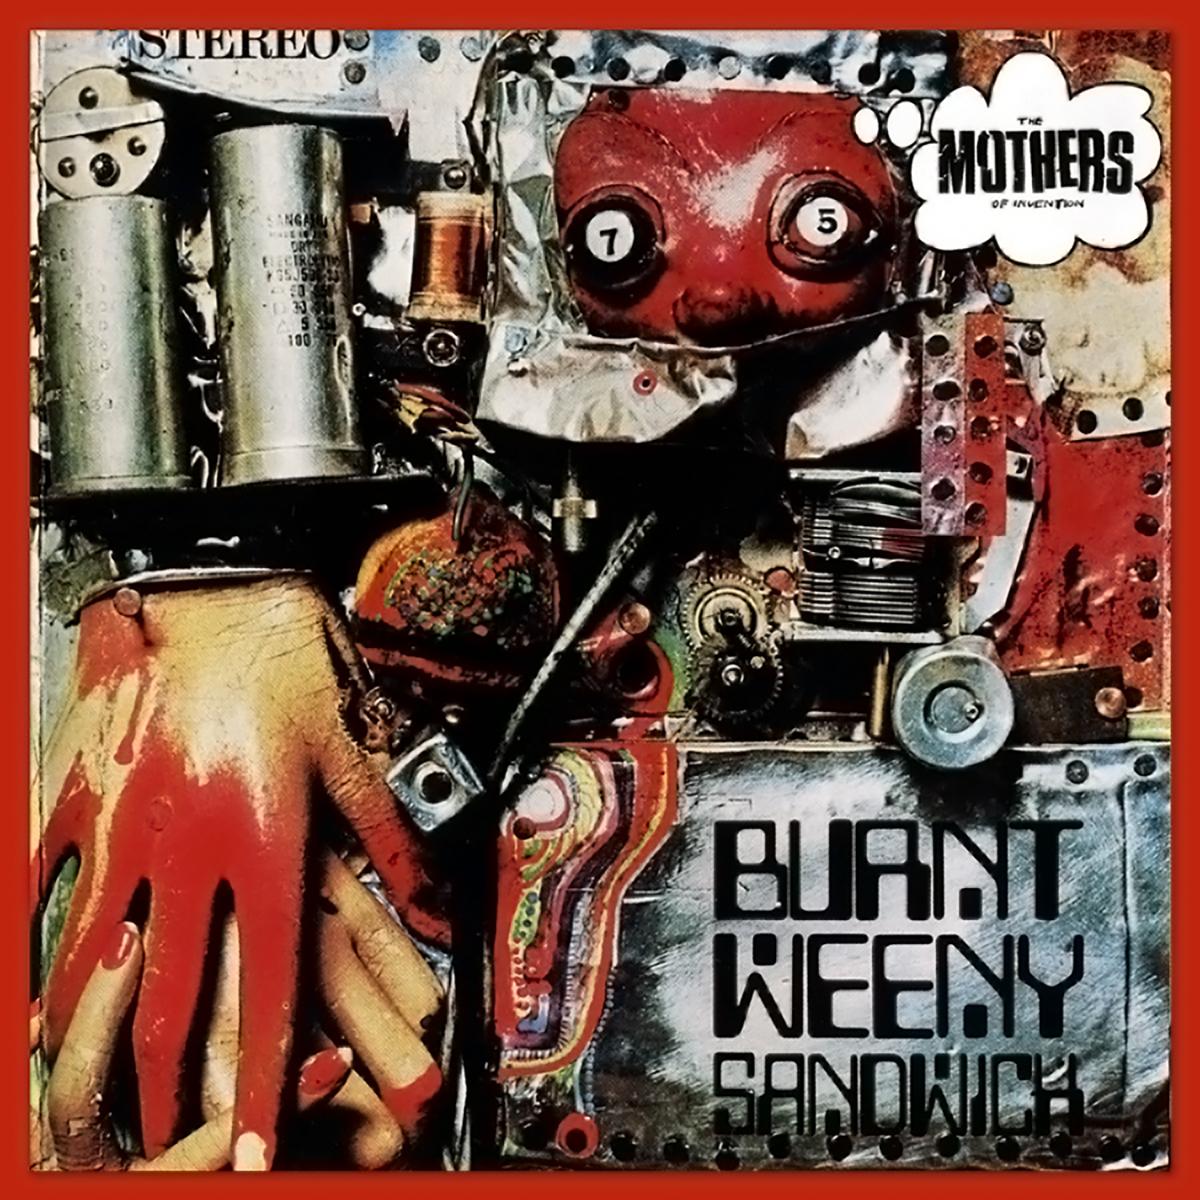 Frank Zappa - Burnt Weeny Sandwich (1970)